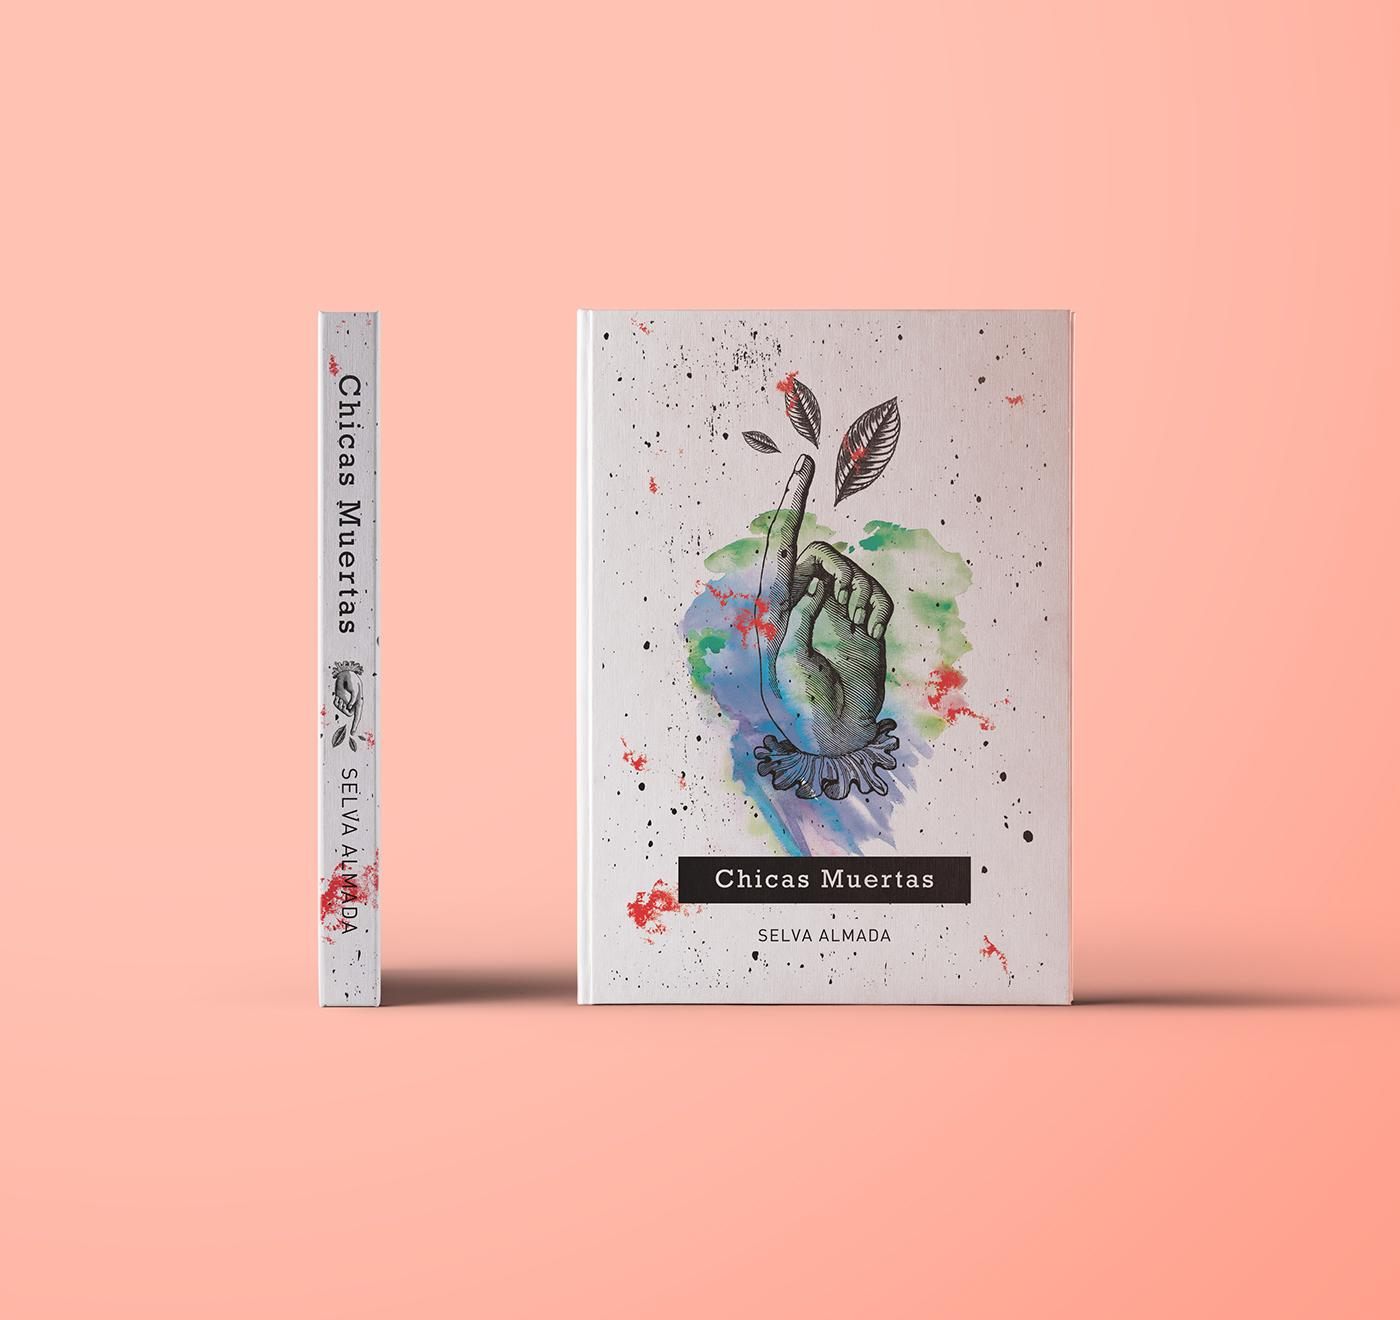 cover books editorial typography   ILLUSTRATION  print colorful portadas libros literature